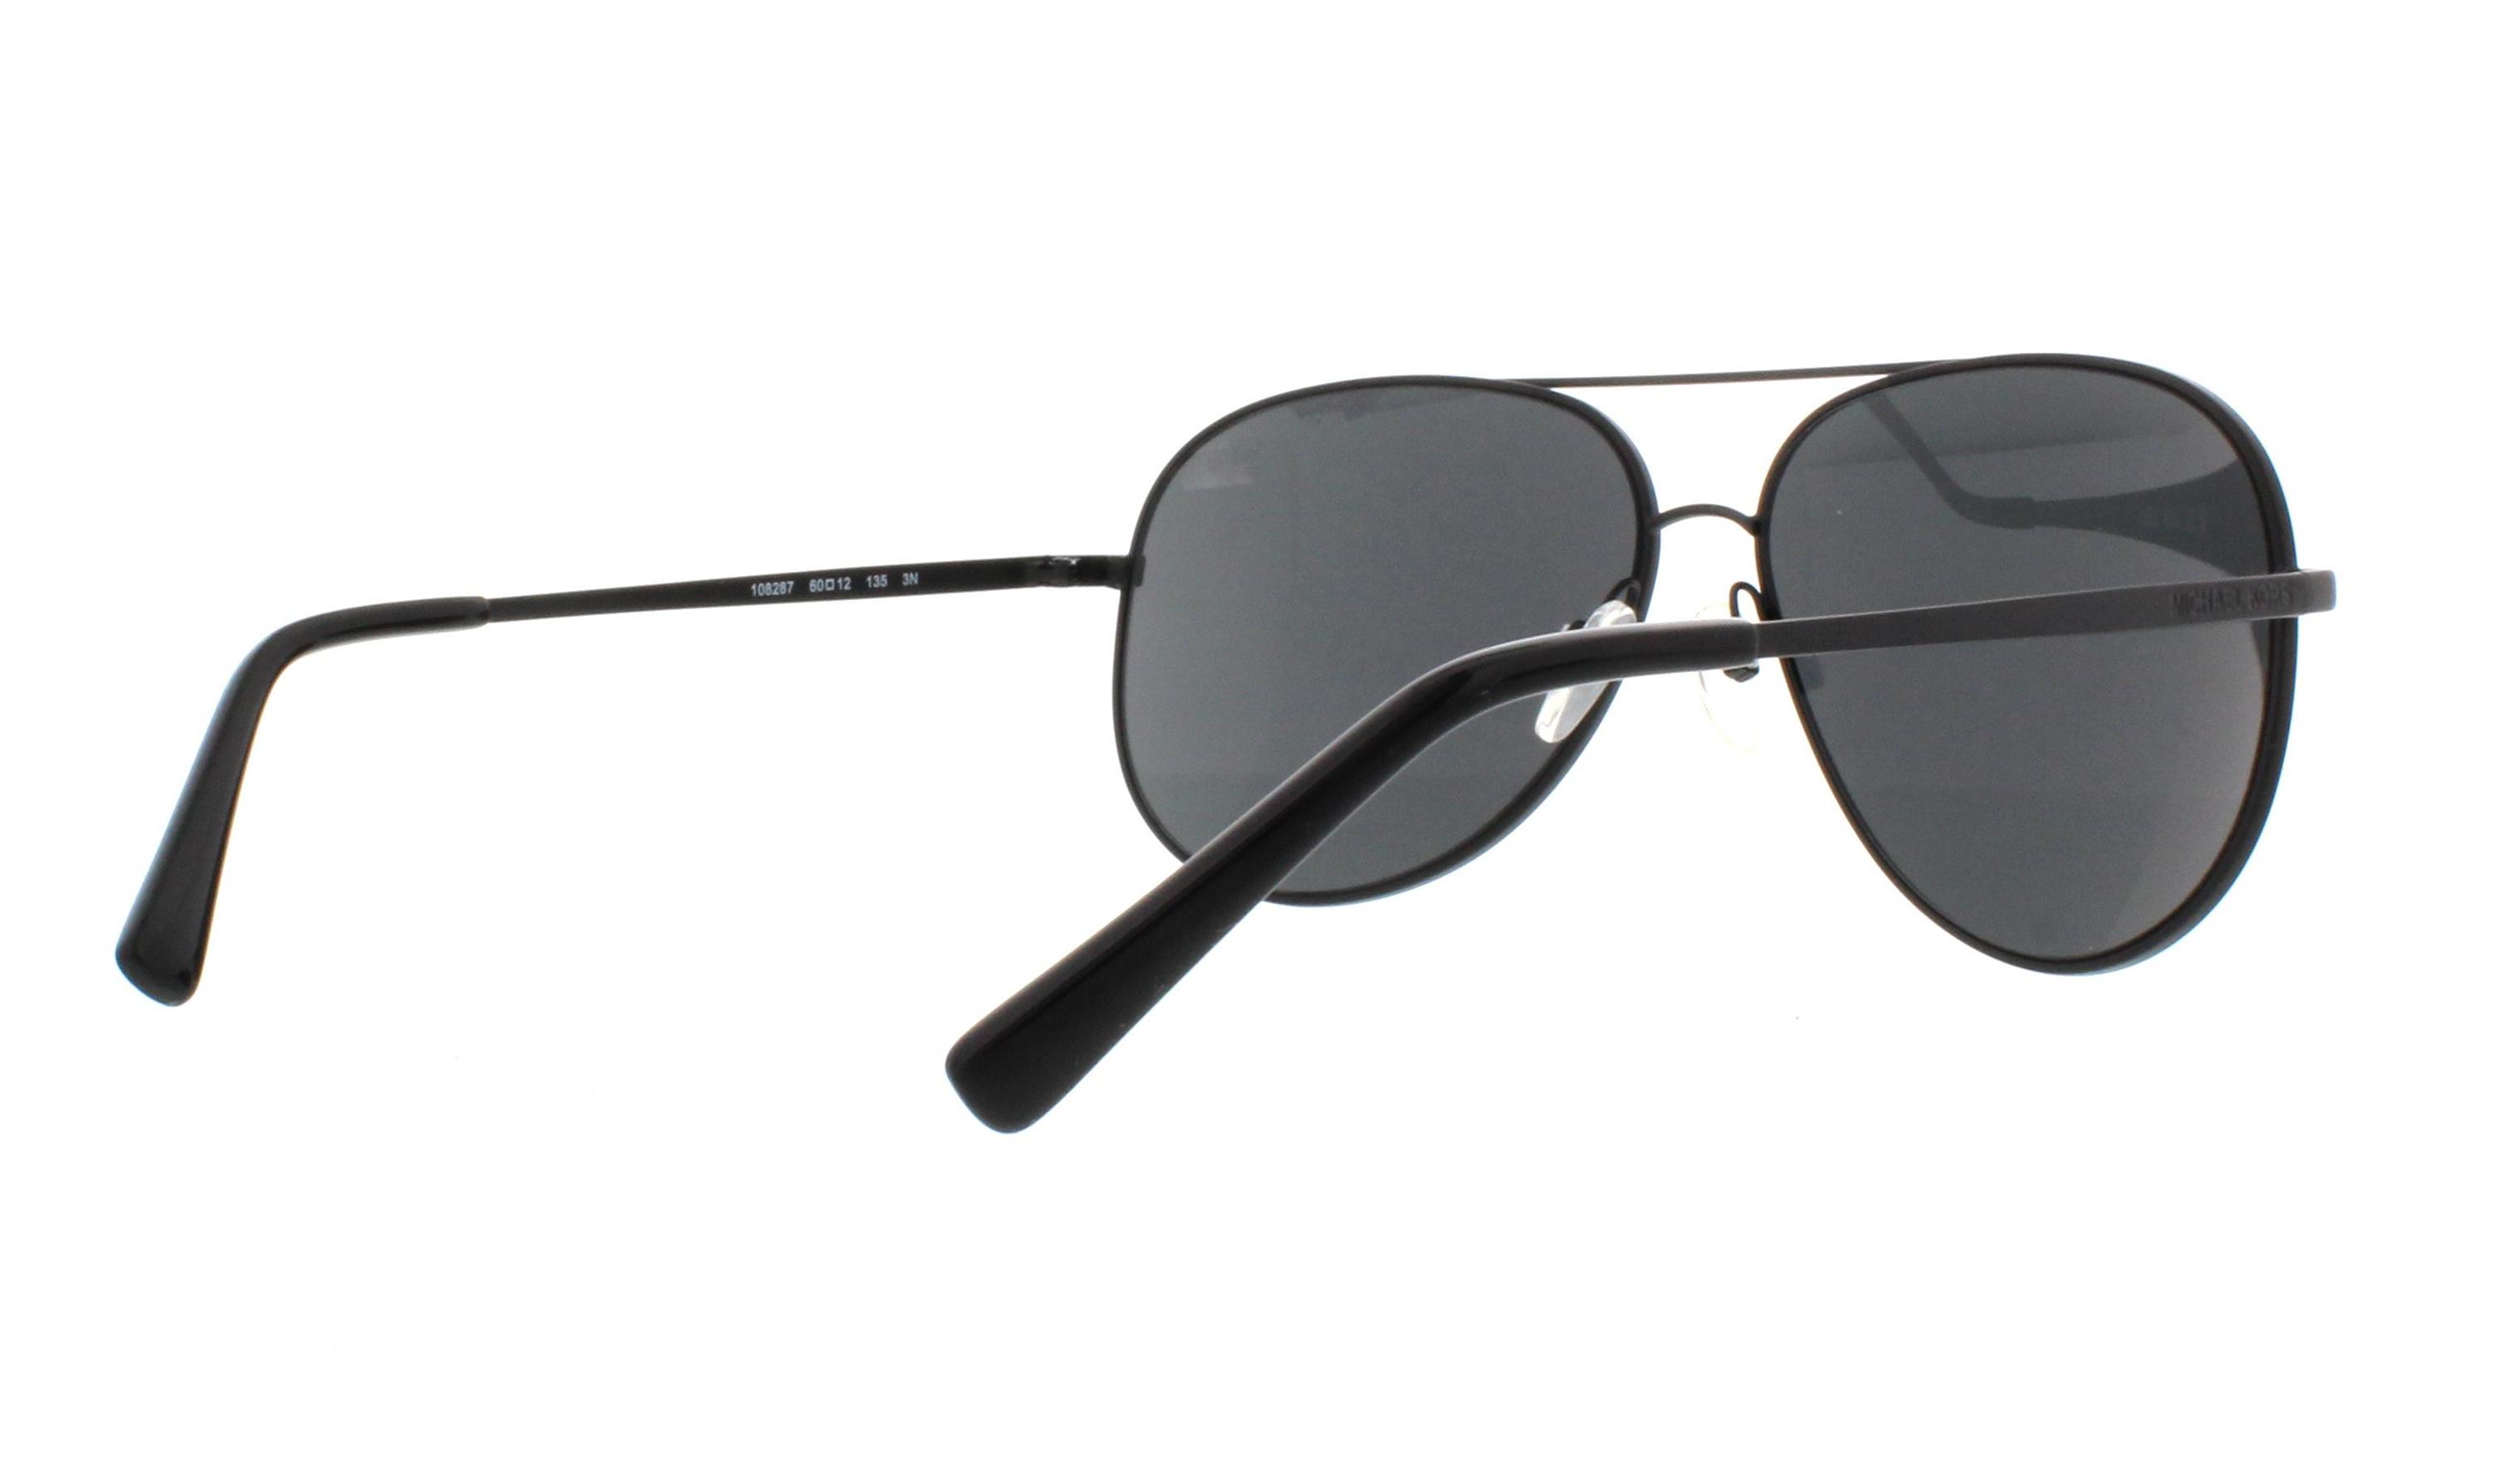 MICHAEL KORS Sunglasses MK5016 KENDALL 108287 Matte Black 60MM ... 097163302d4